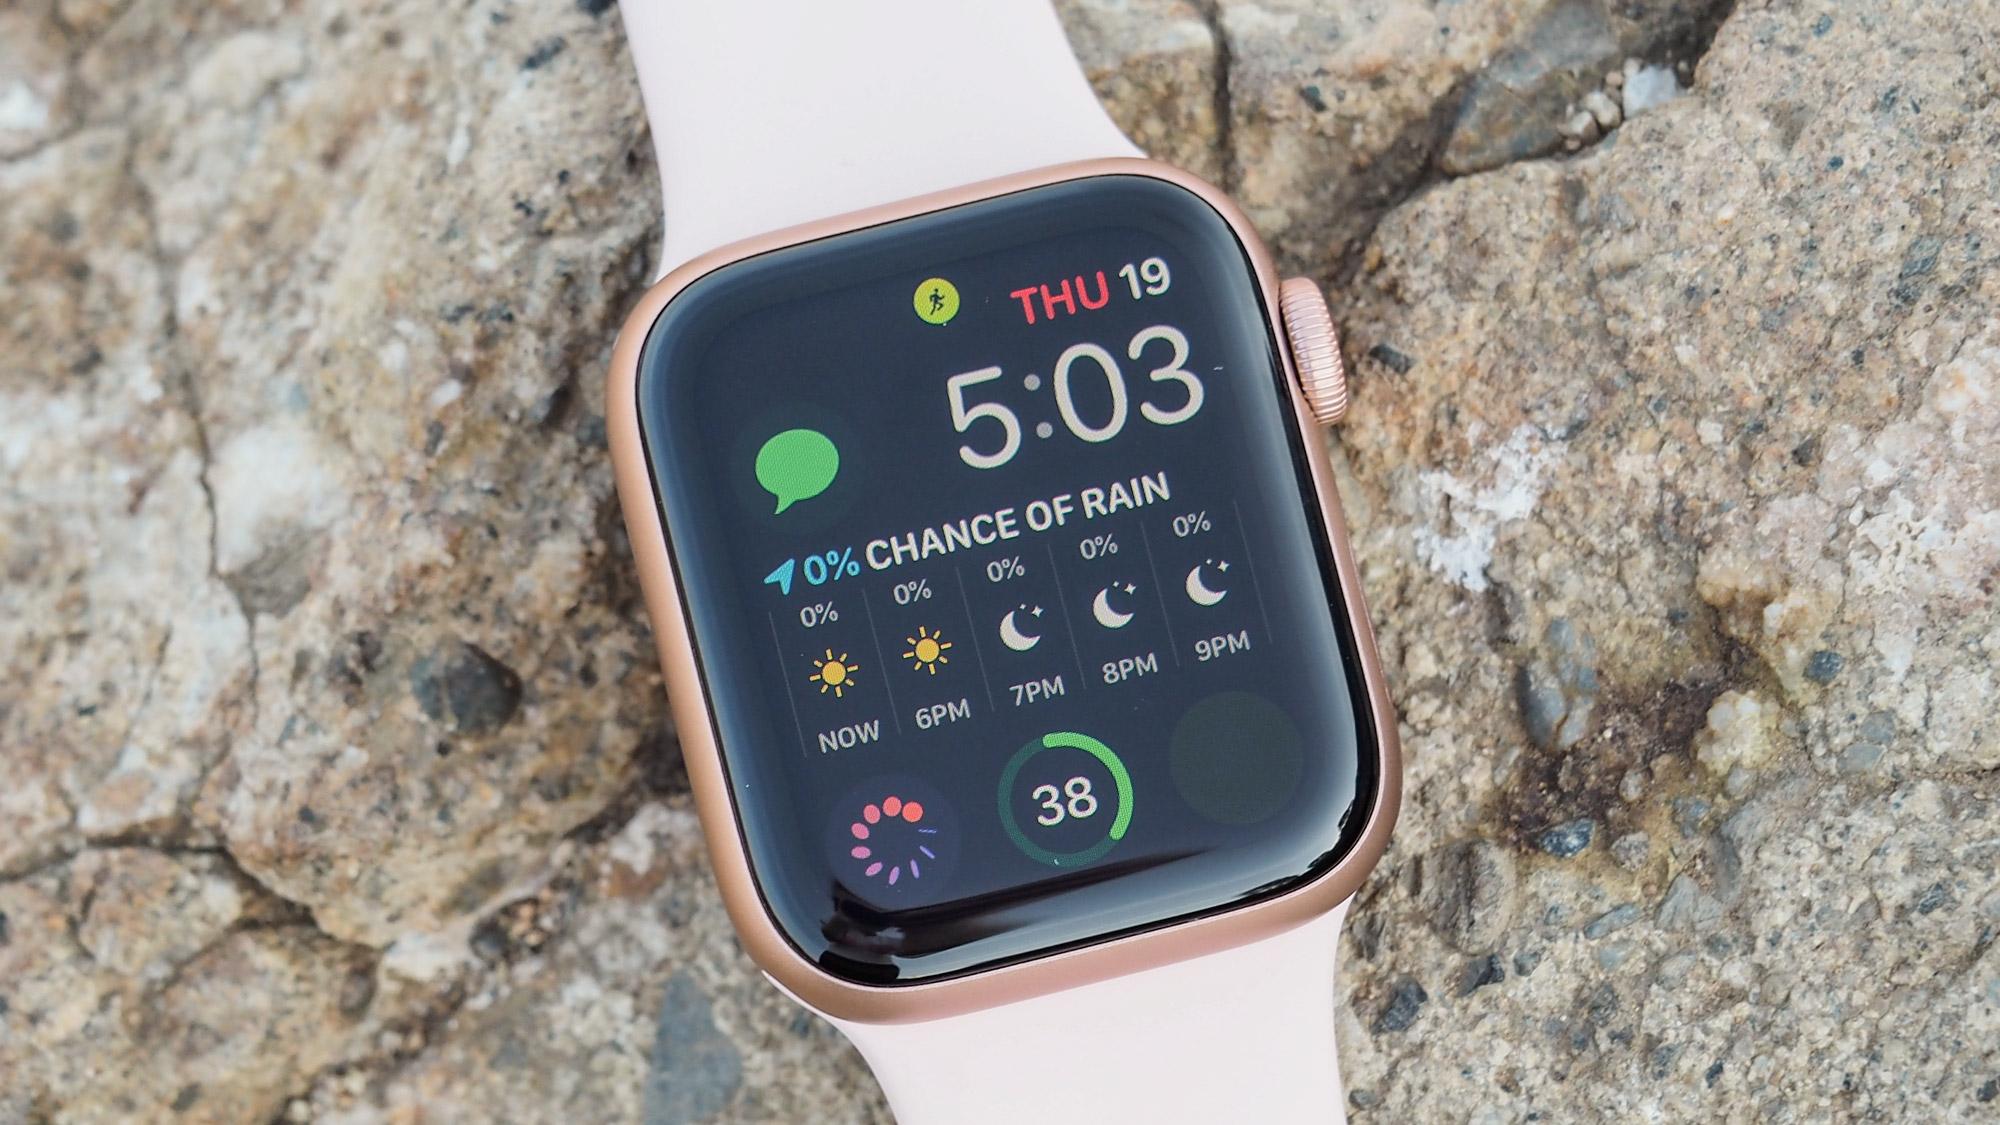 Apple Watch Series 5 , Apple Watch Series 5 Cam ,Apple Watch Series 5 Camera test,Apple Watch Series 5 Screen Repair, Apple Watch Series 5 Camera, Apple Watch Series 5 Unboxing, Apple Watch Series 5 Hands-on